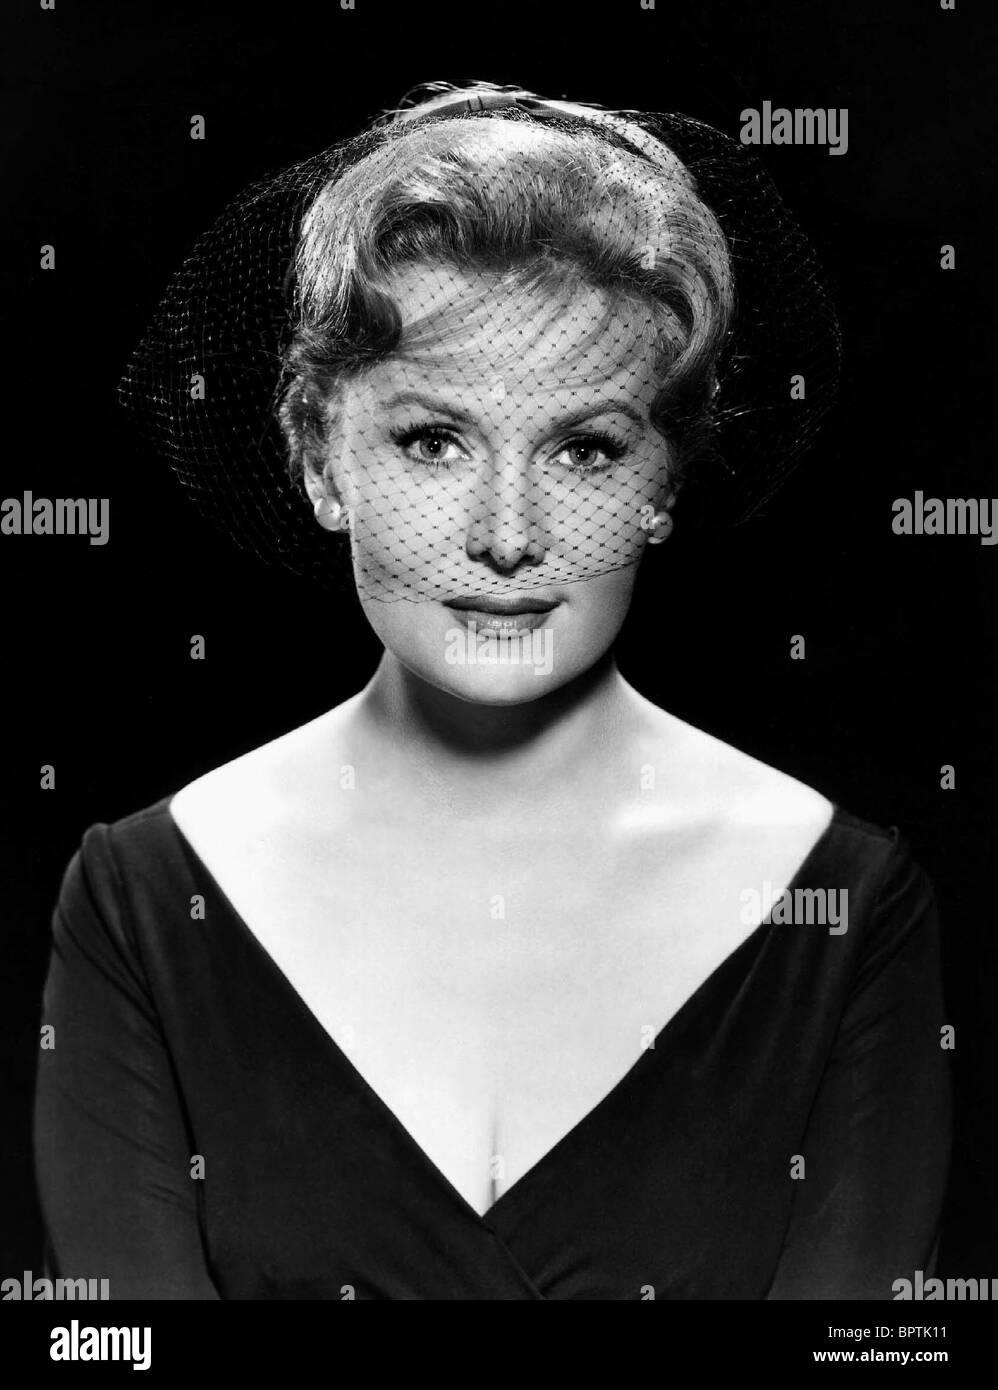 RHONDA FLEMING ACTRESS (1960) - Stock Image